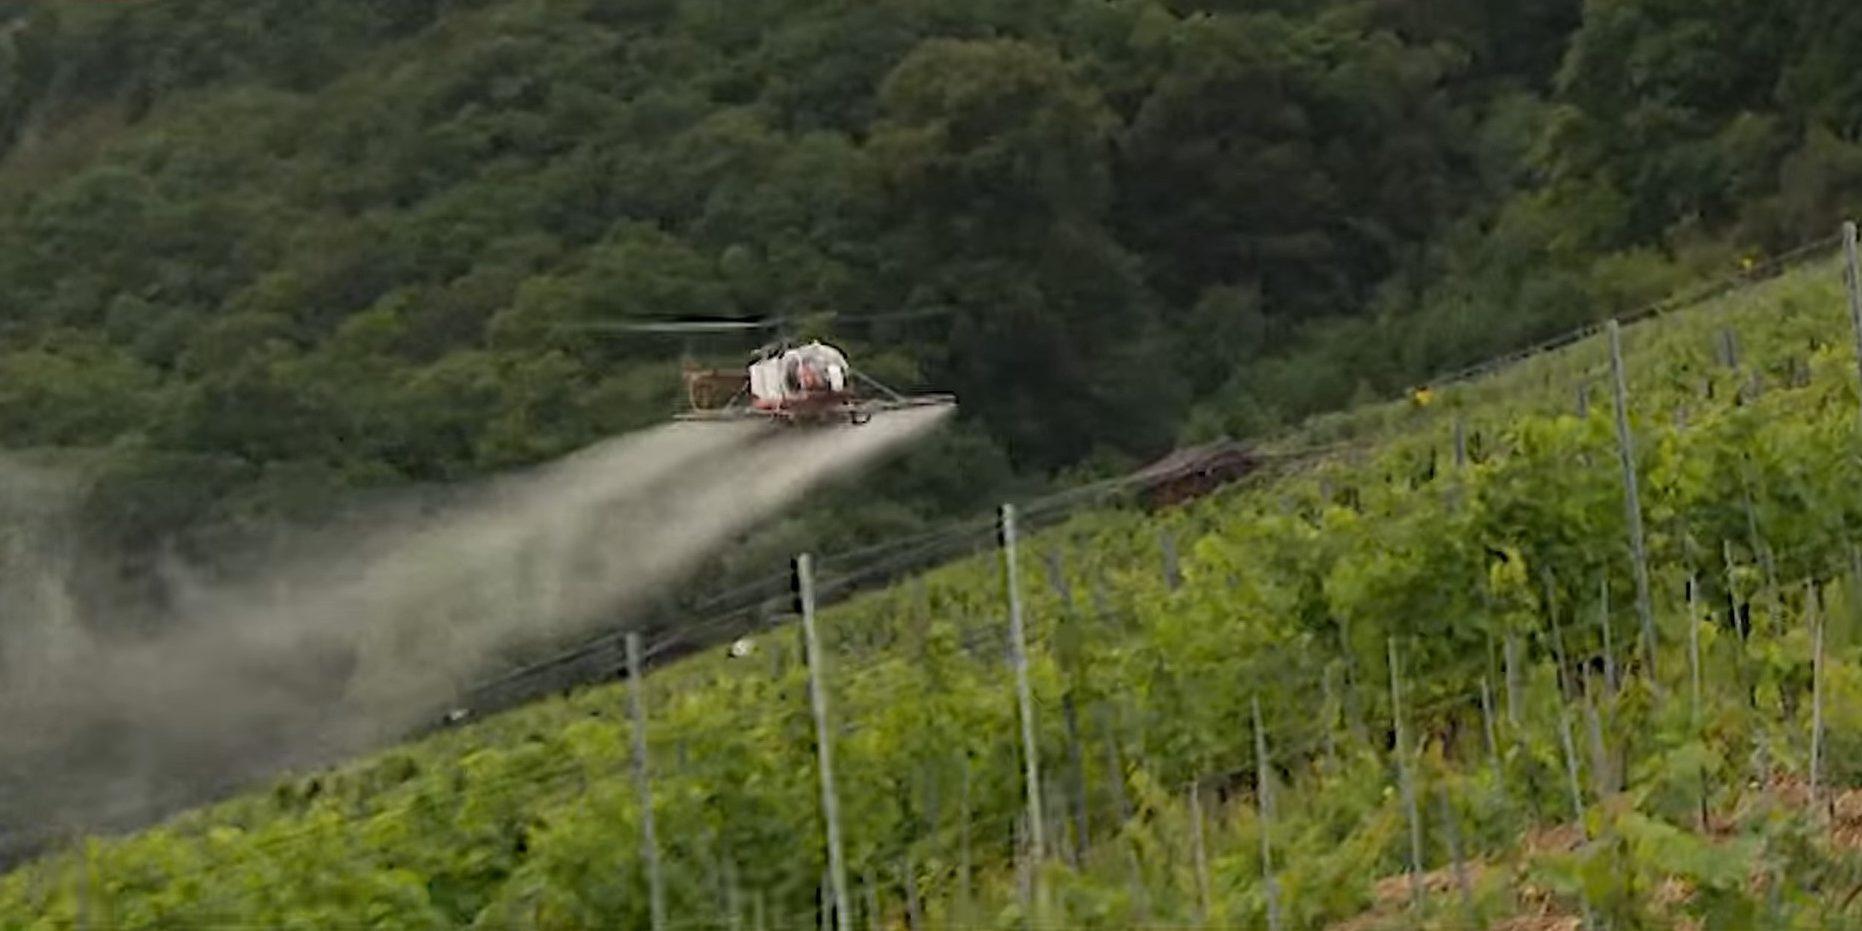 Helikopter Pestizide